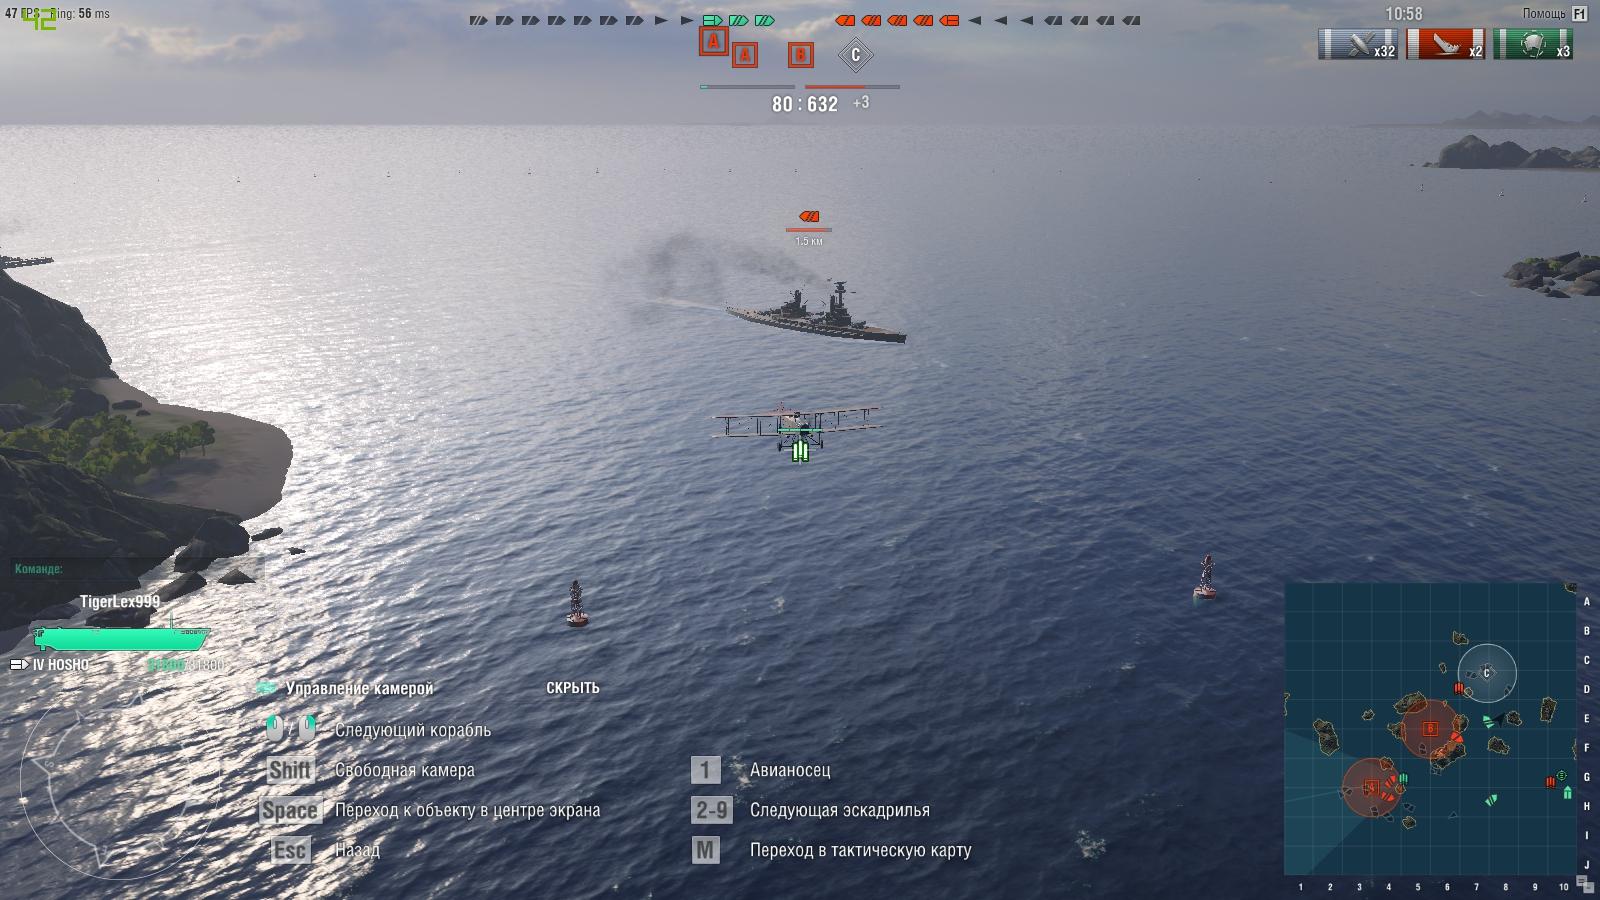 shot-17.07.08_16.16.25-0726.jpg - World of Warships